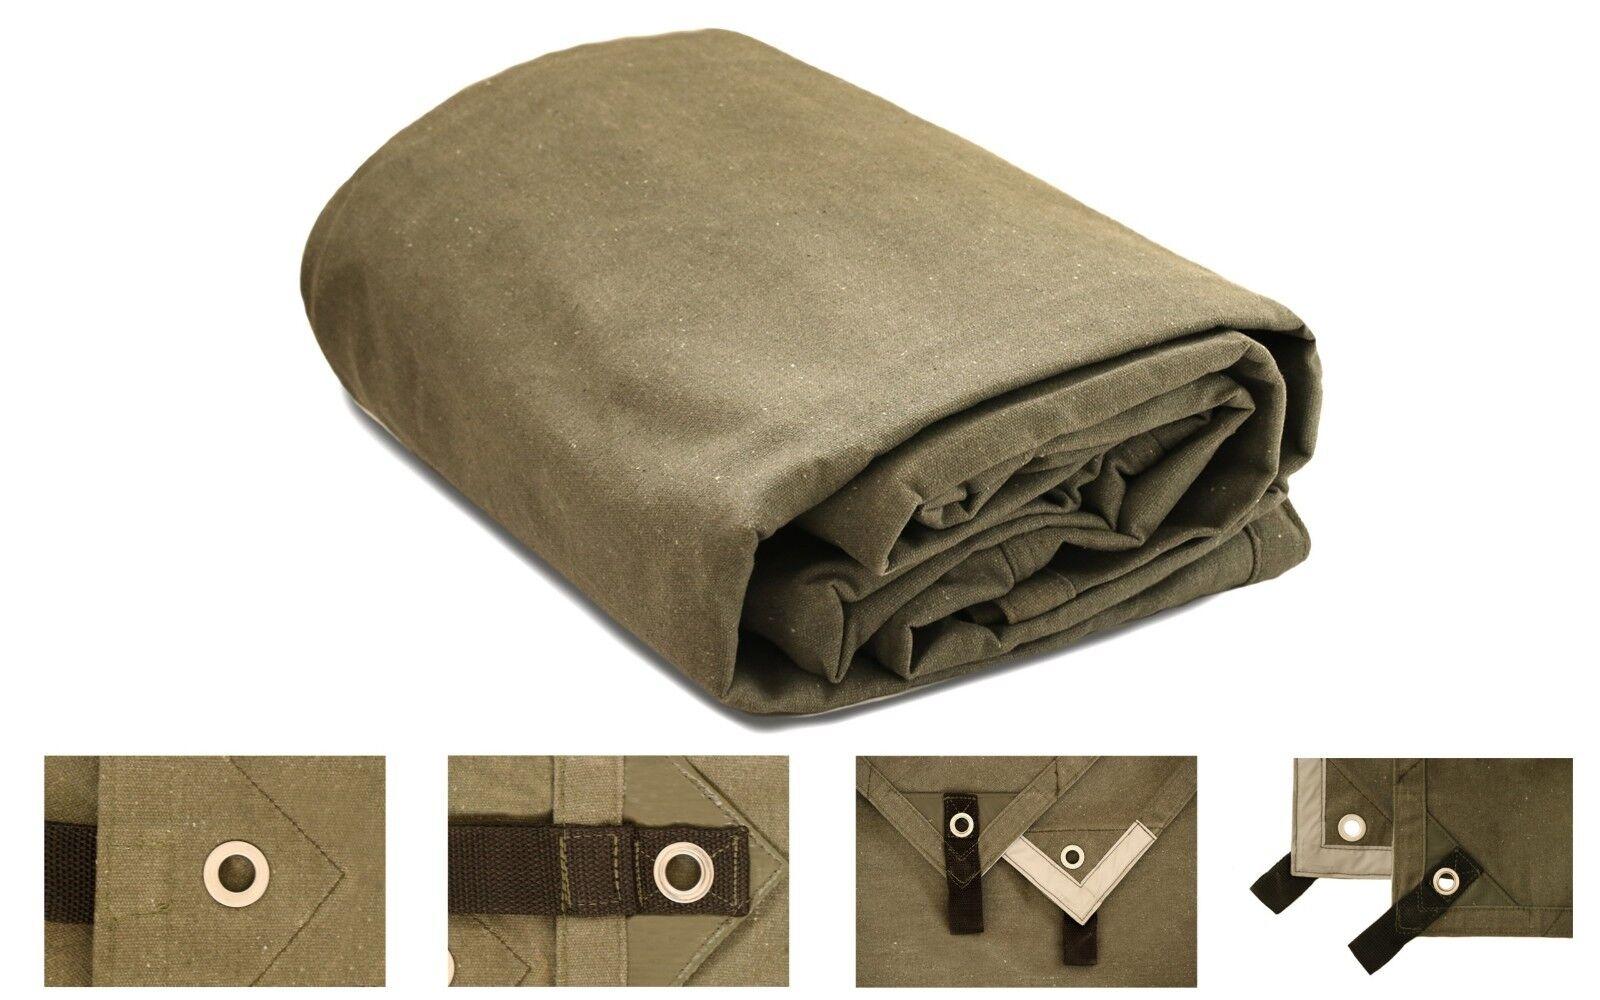 8/' x 20/' Canvas Tarp 2.4X6M Green Cotton Tarpaulin Heavy Duty Waterproof Supply